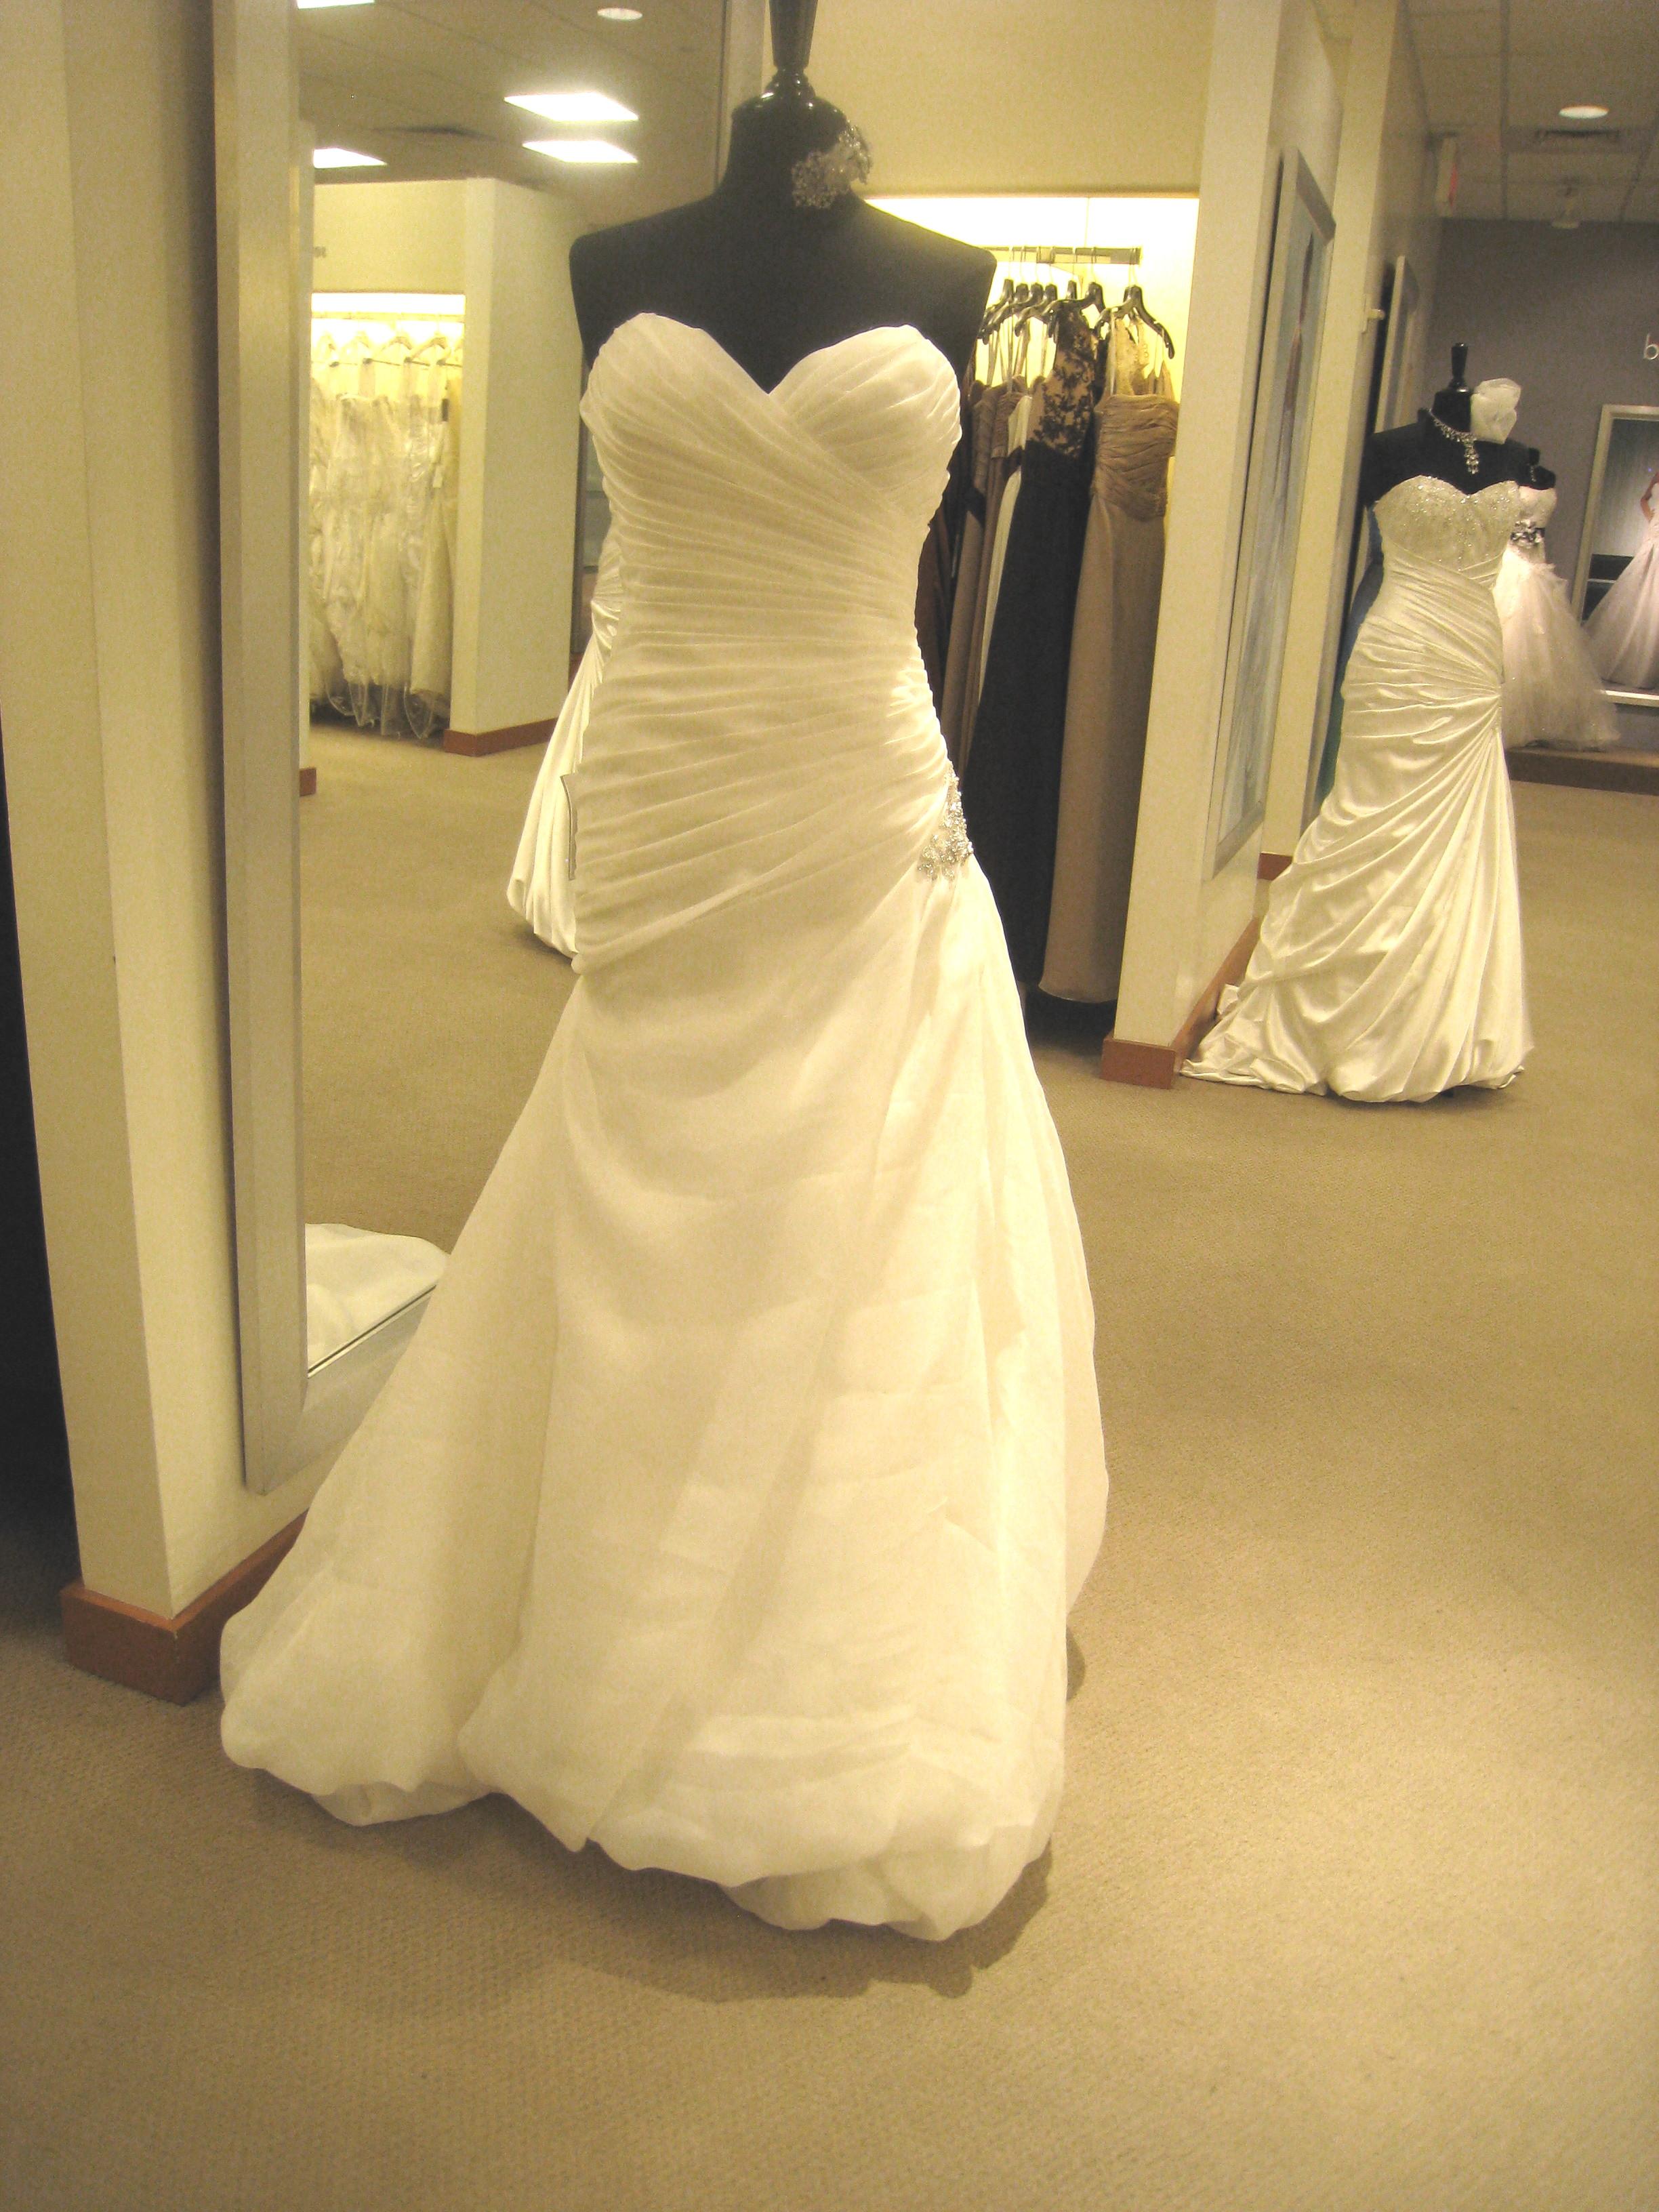 holy crap im getting married macy's wedding dresses 40w wedding